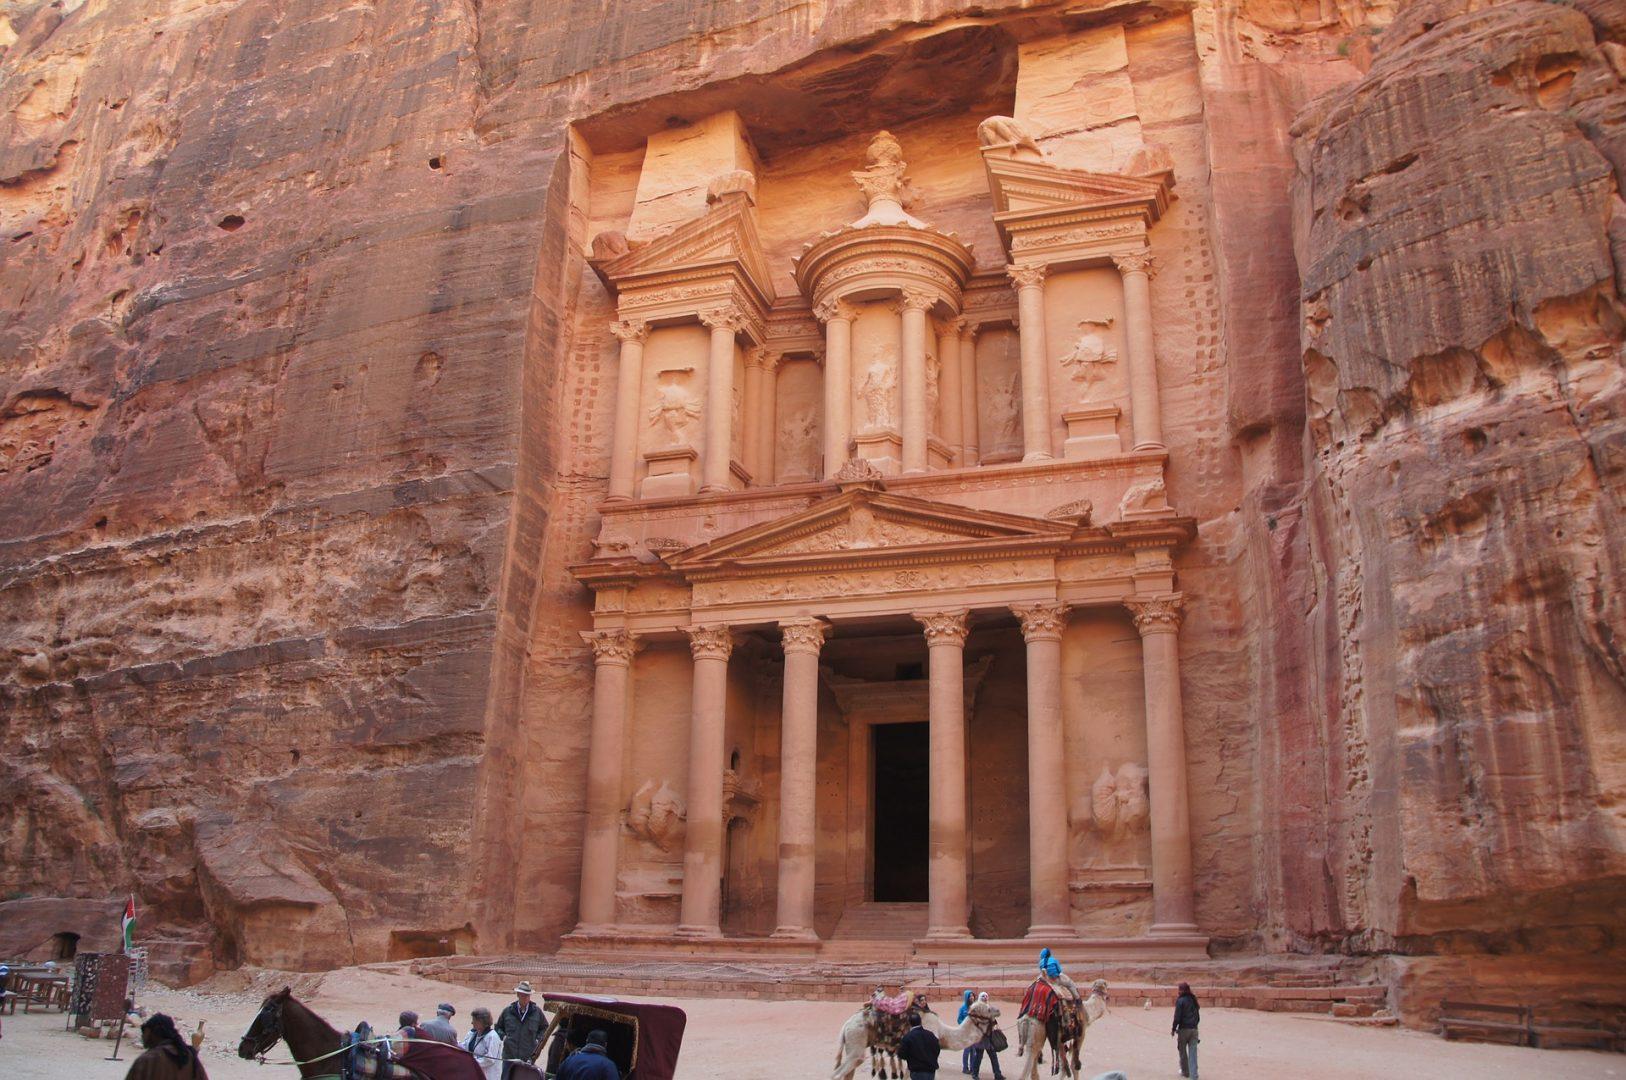 The wonders of Petra